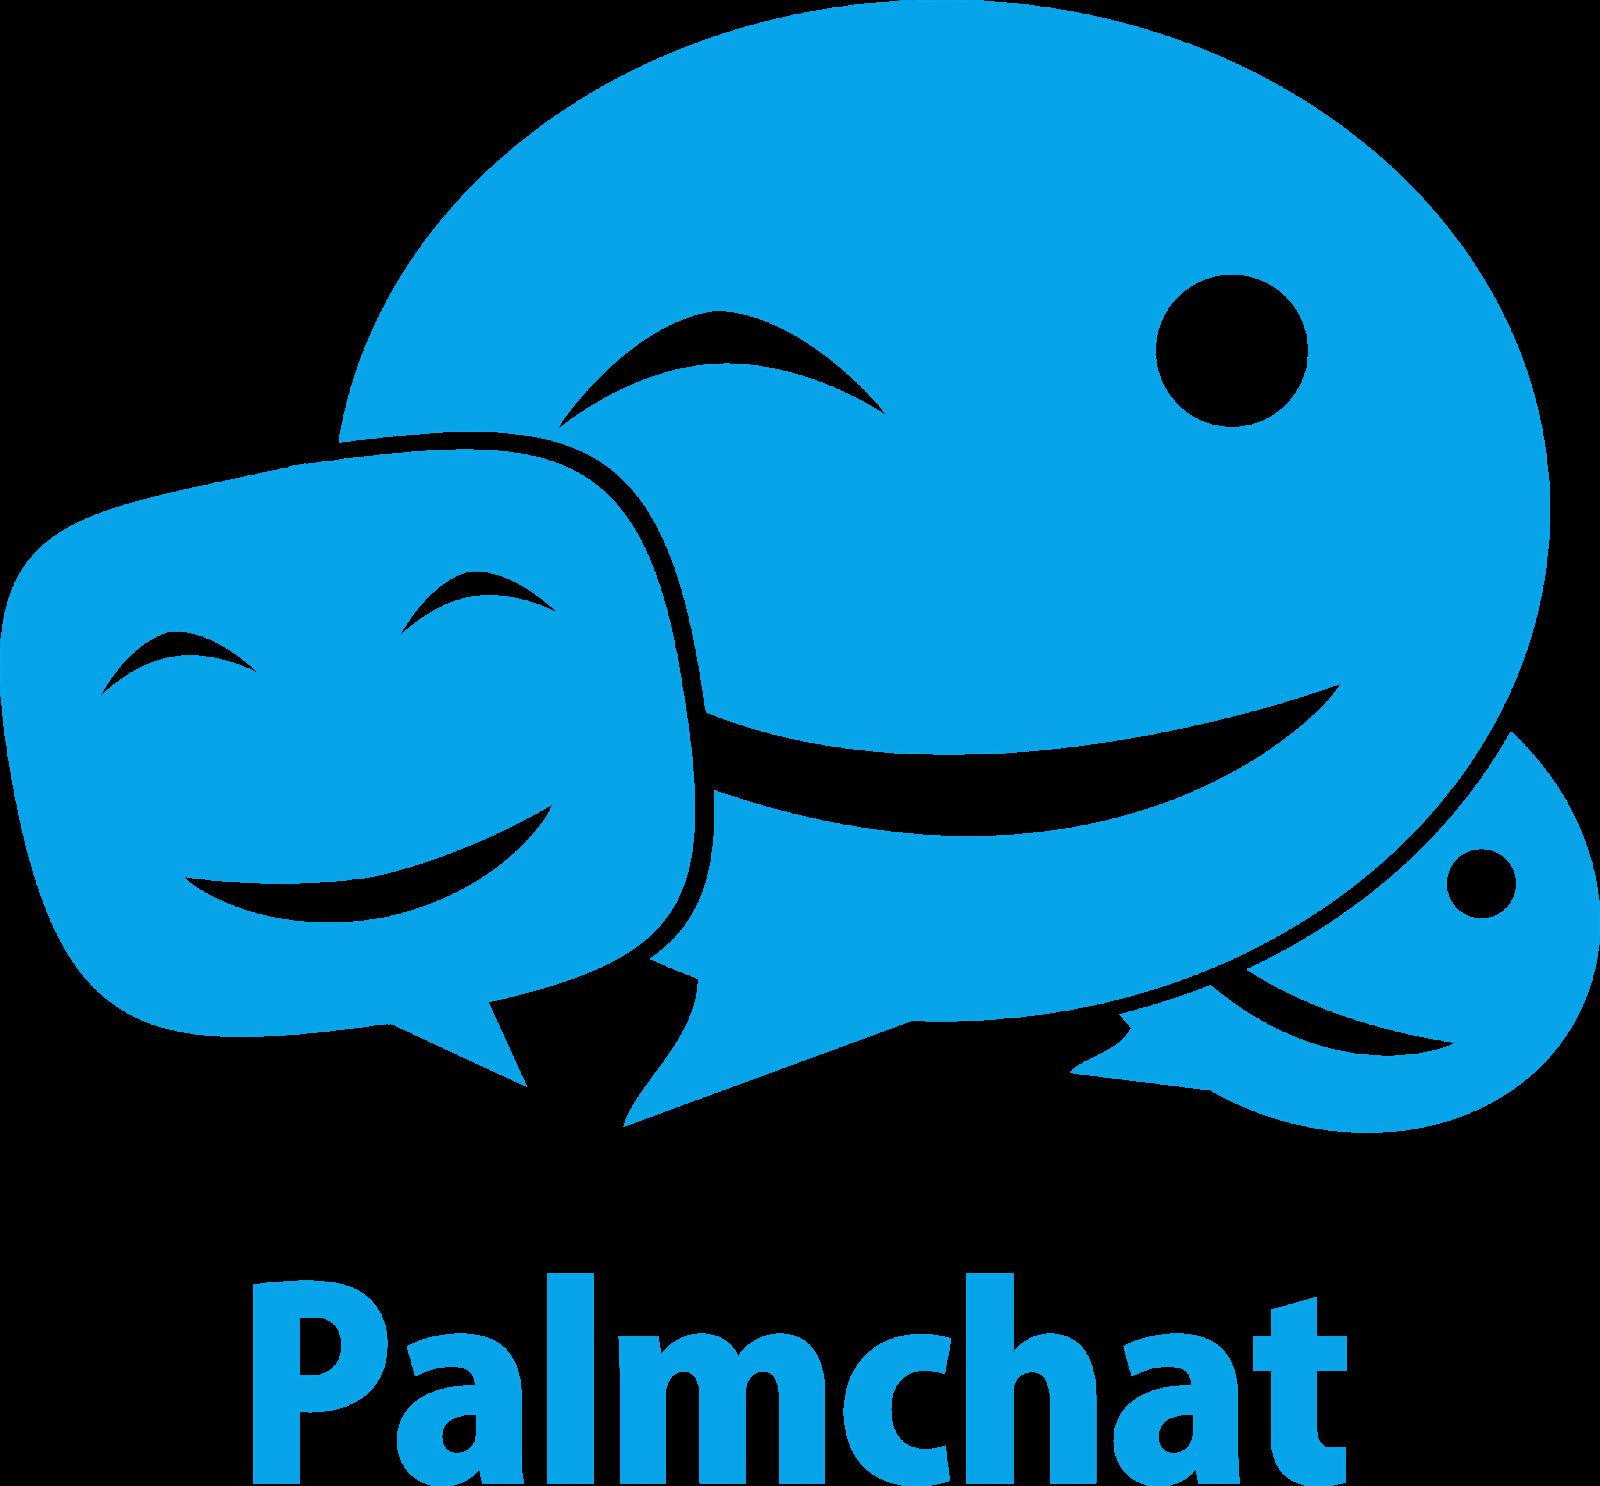 Palmchat dating advice